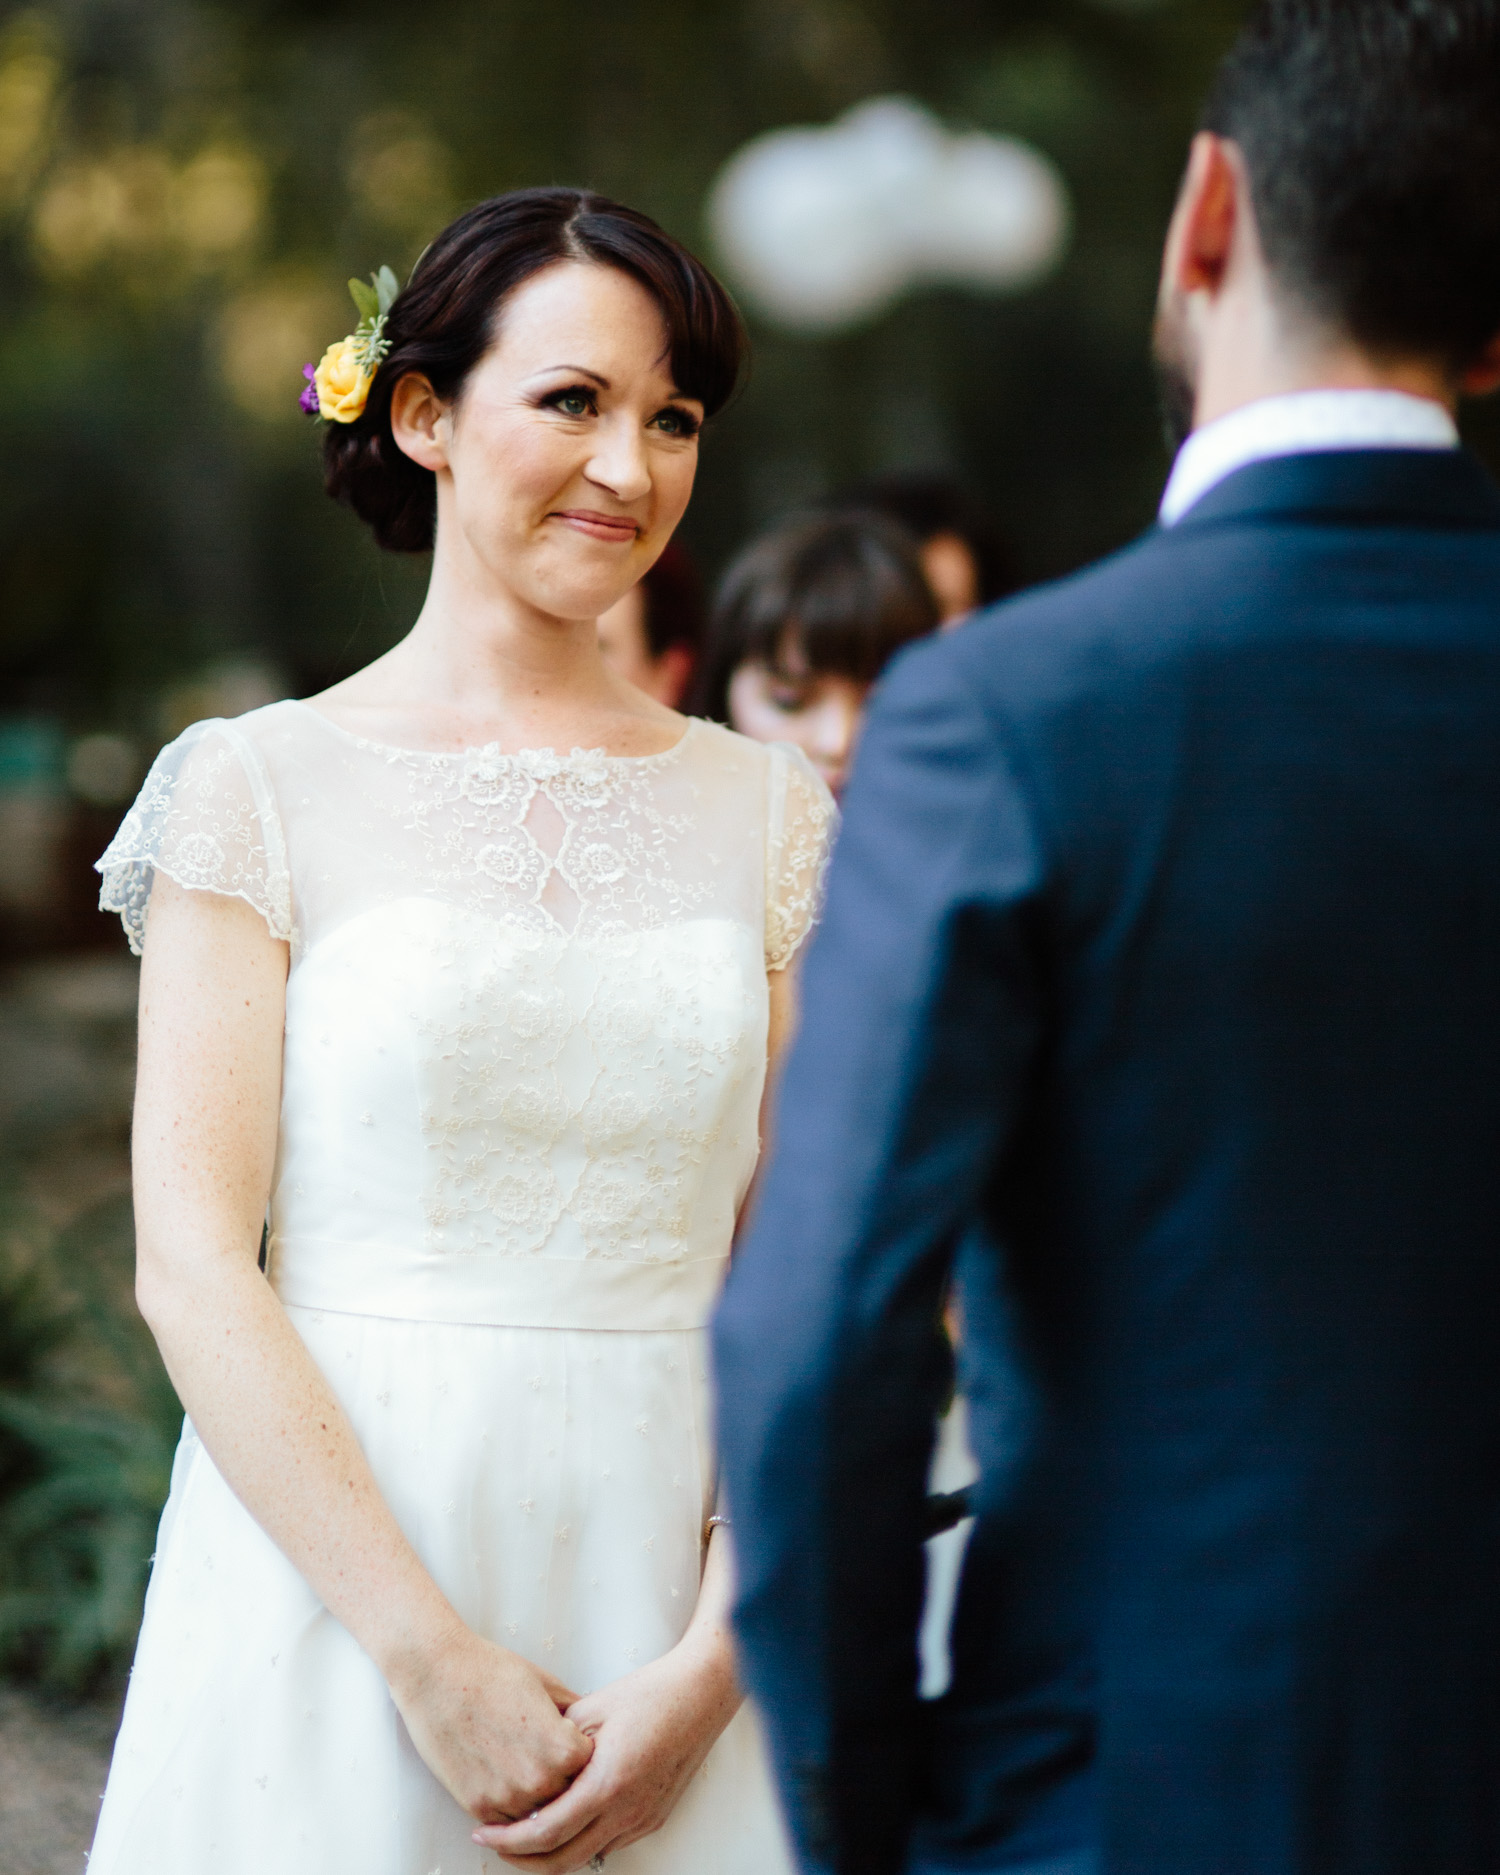 Ojai Wedding Photographer, Calliote Canyon Wedding - The Gathering Season x weareleoandkat 035.JPG